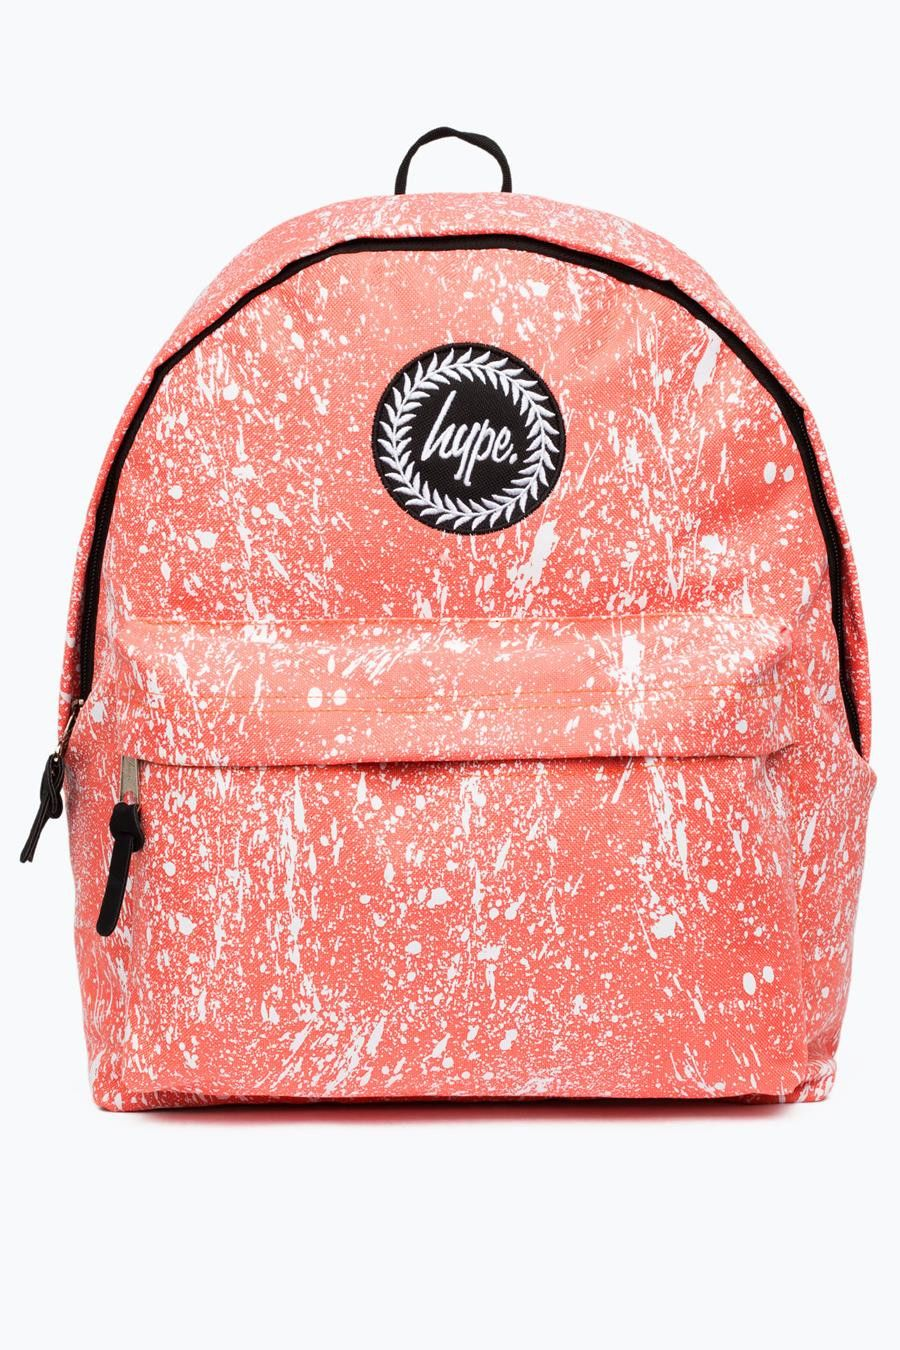 4fdbee96c Hype peach splat backpack in 2019 | Style | Backpacks, Hype bags ...